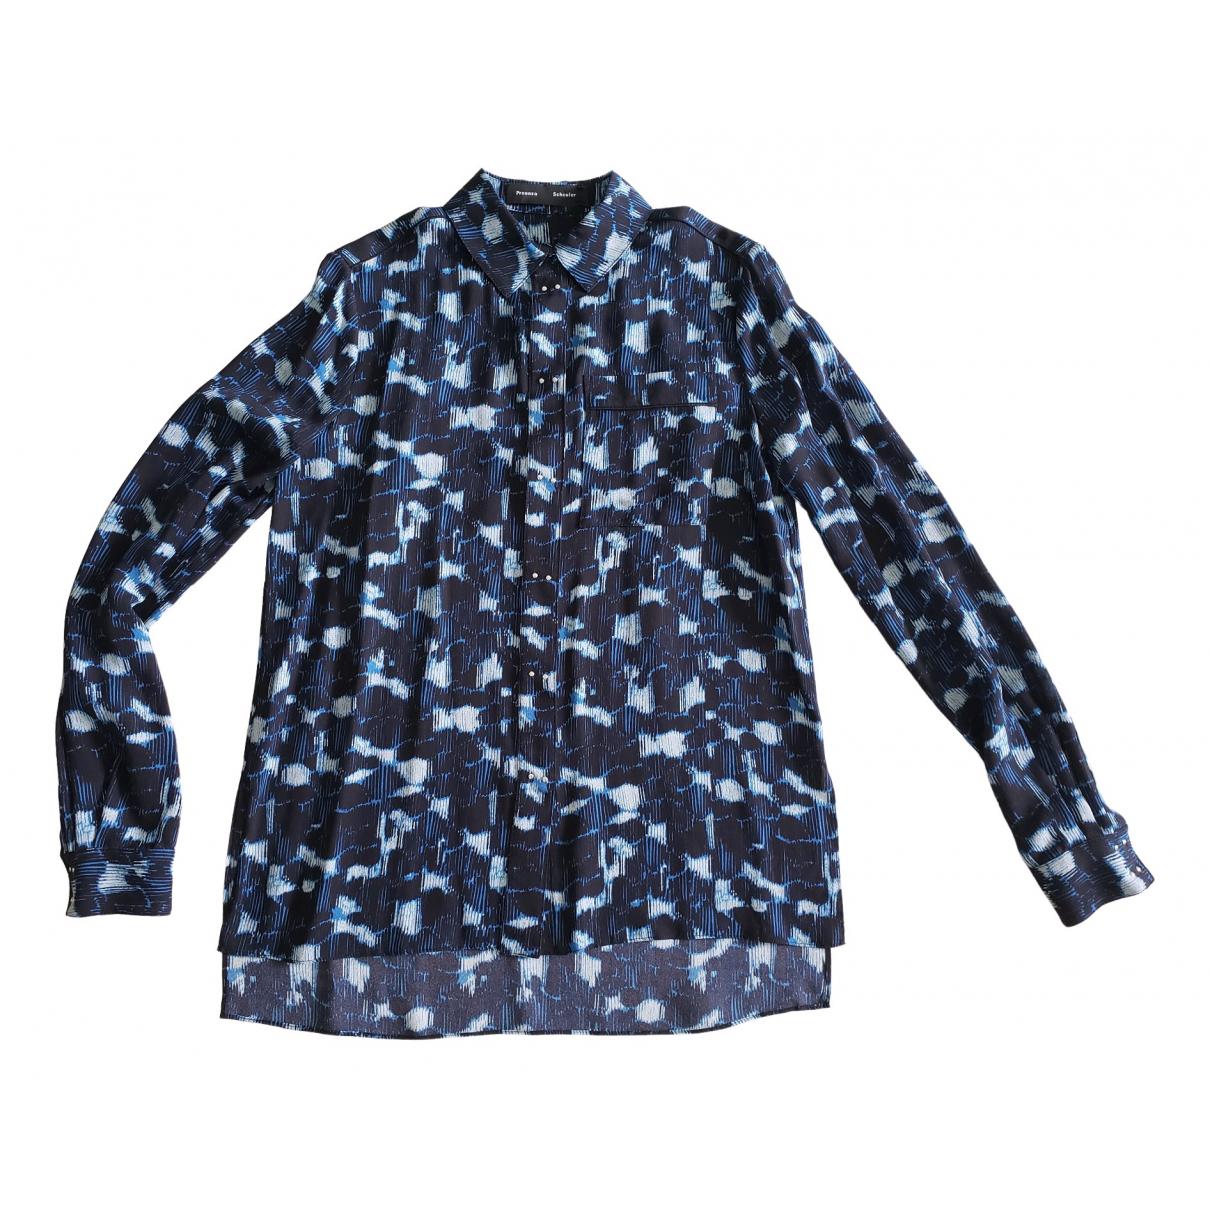 Proenza Schouler - Top   pour femme en soie - bleu